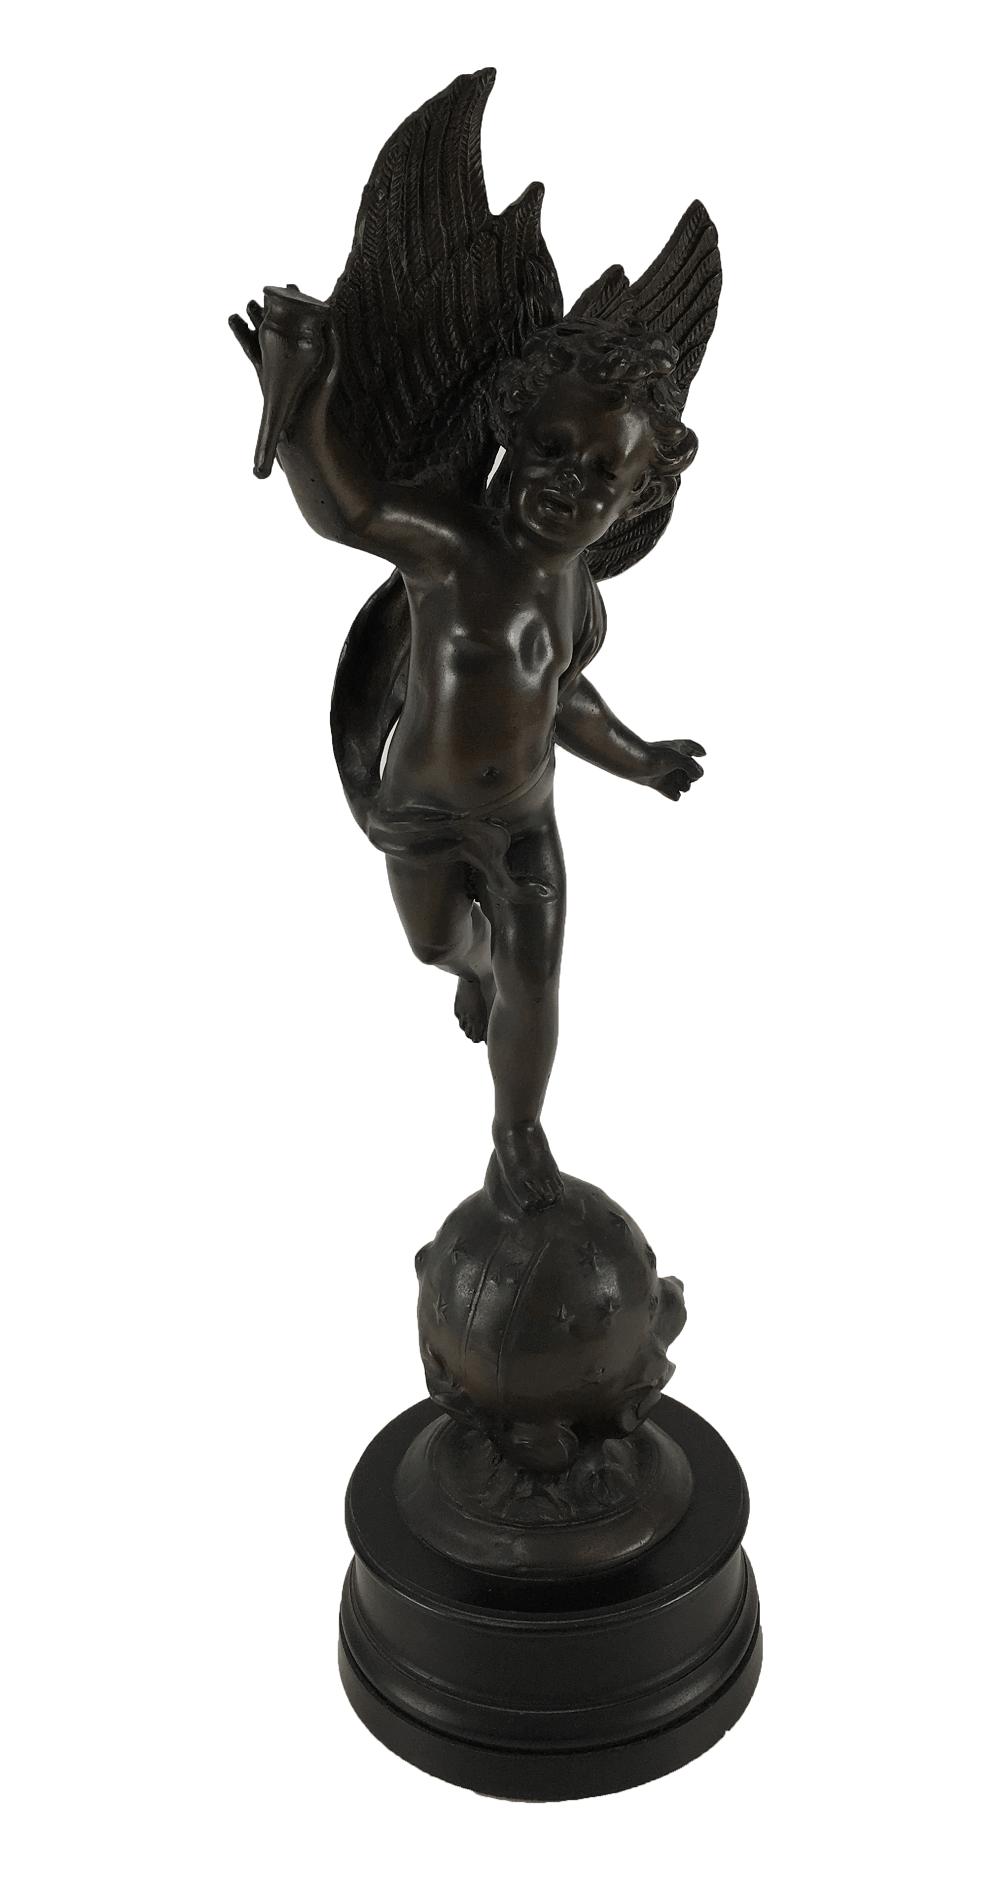 Linda Escultura Anjo Resina Imitando Bronze 51cm